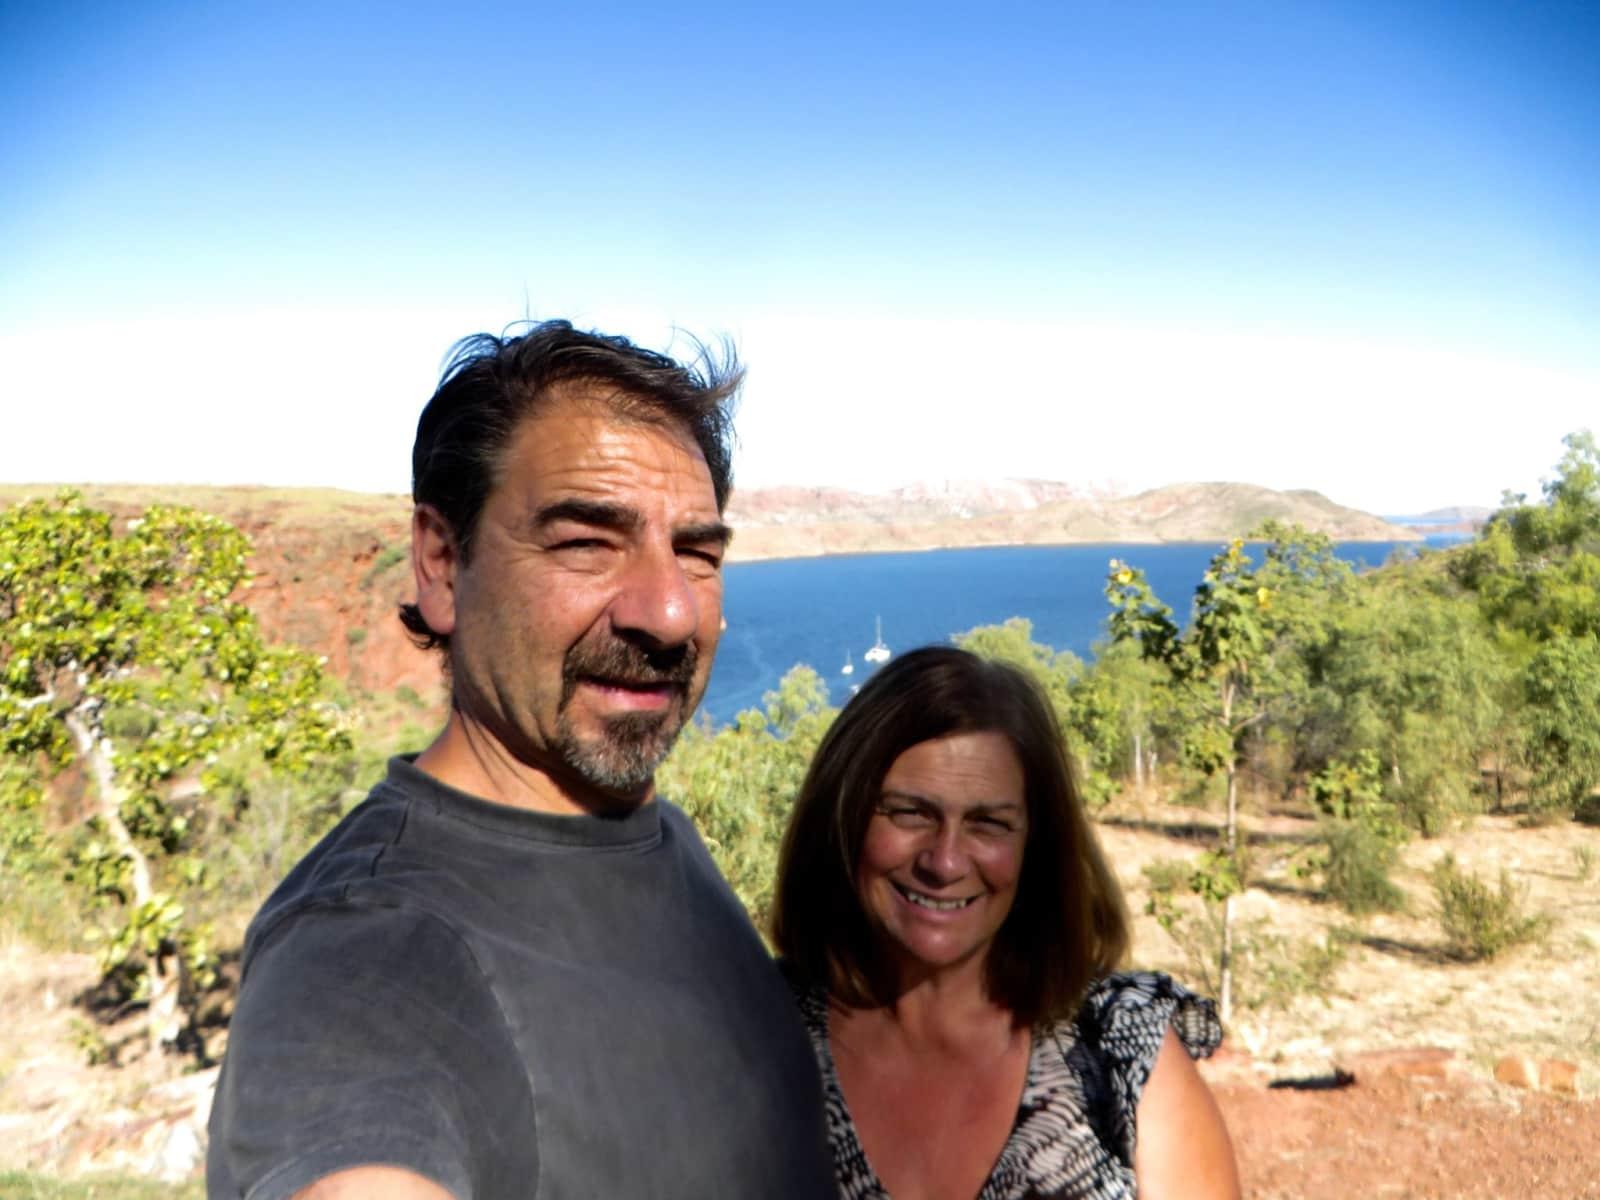 Lauri & Pam from Torquay, Victoria, Australia